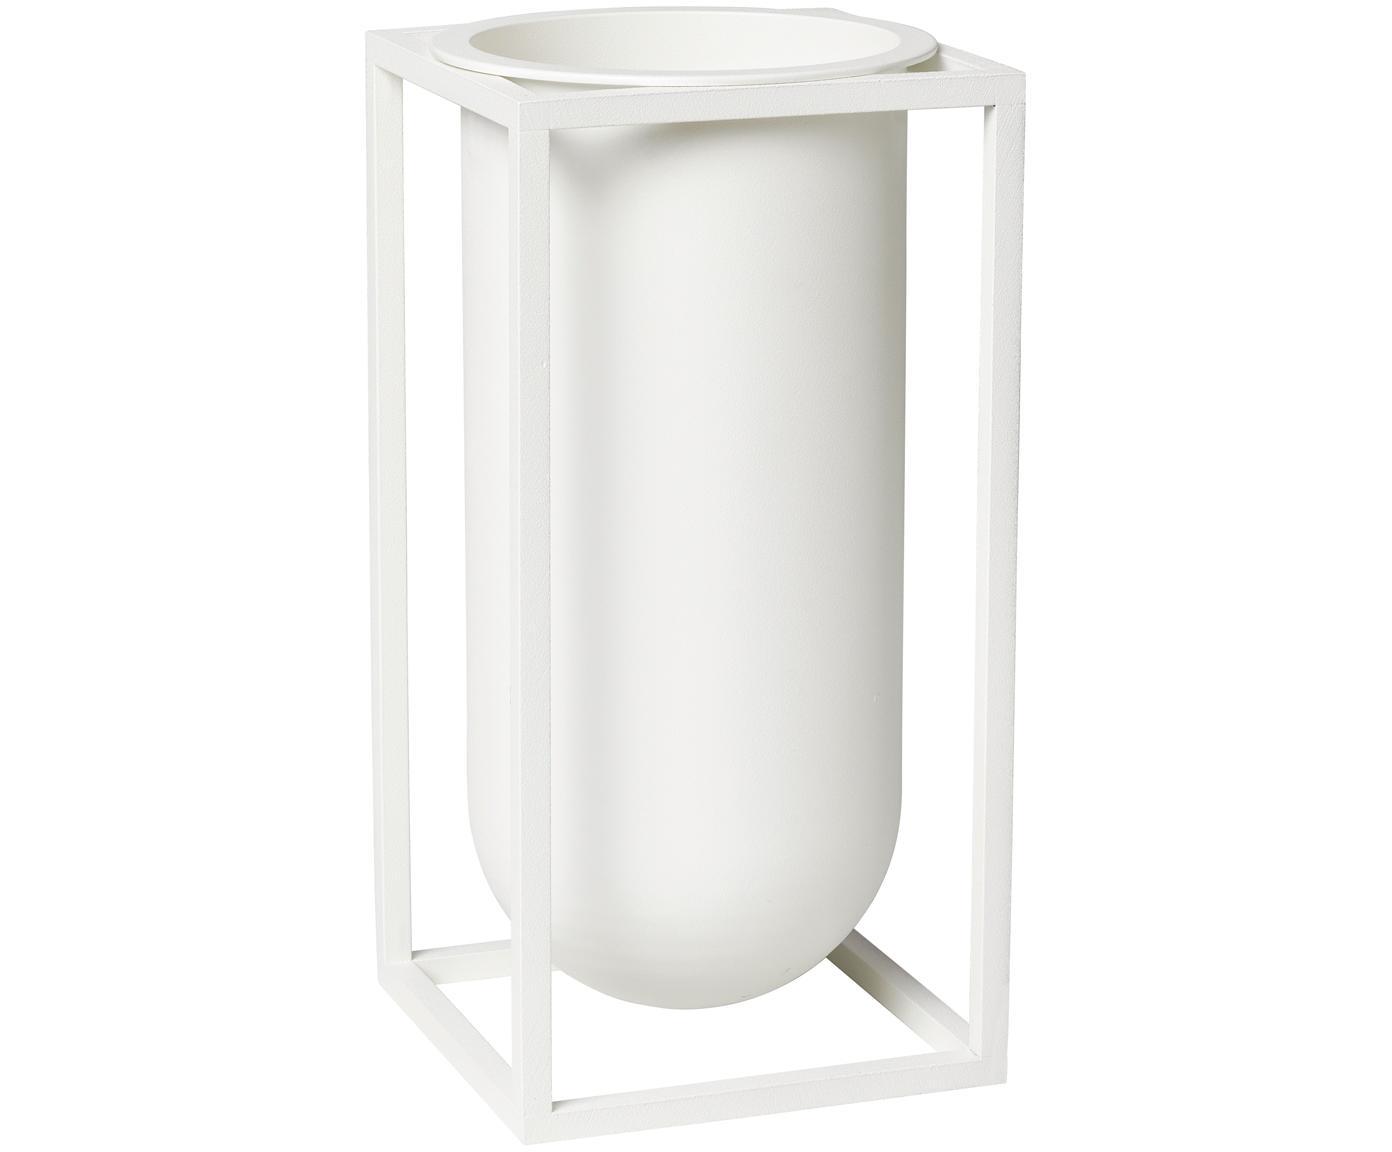 Handgemaakte vaas Kubus van aluminium, Gelakt aluminium, Wit, 10 x 20 cm